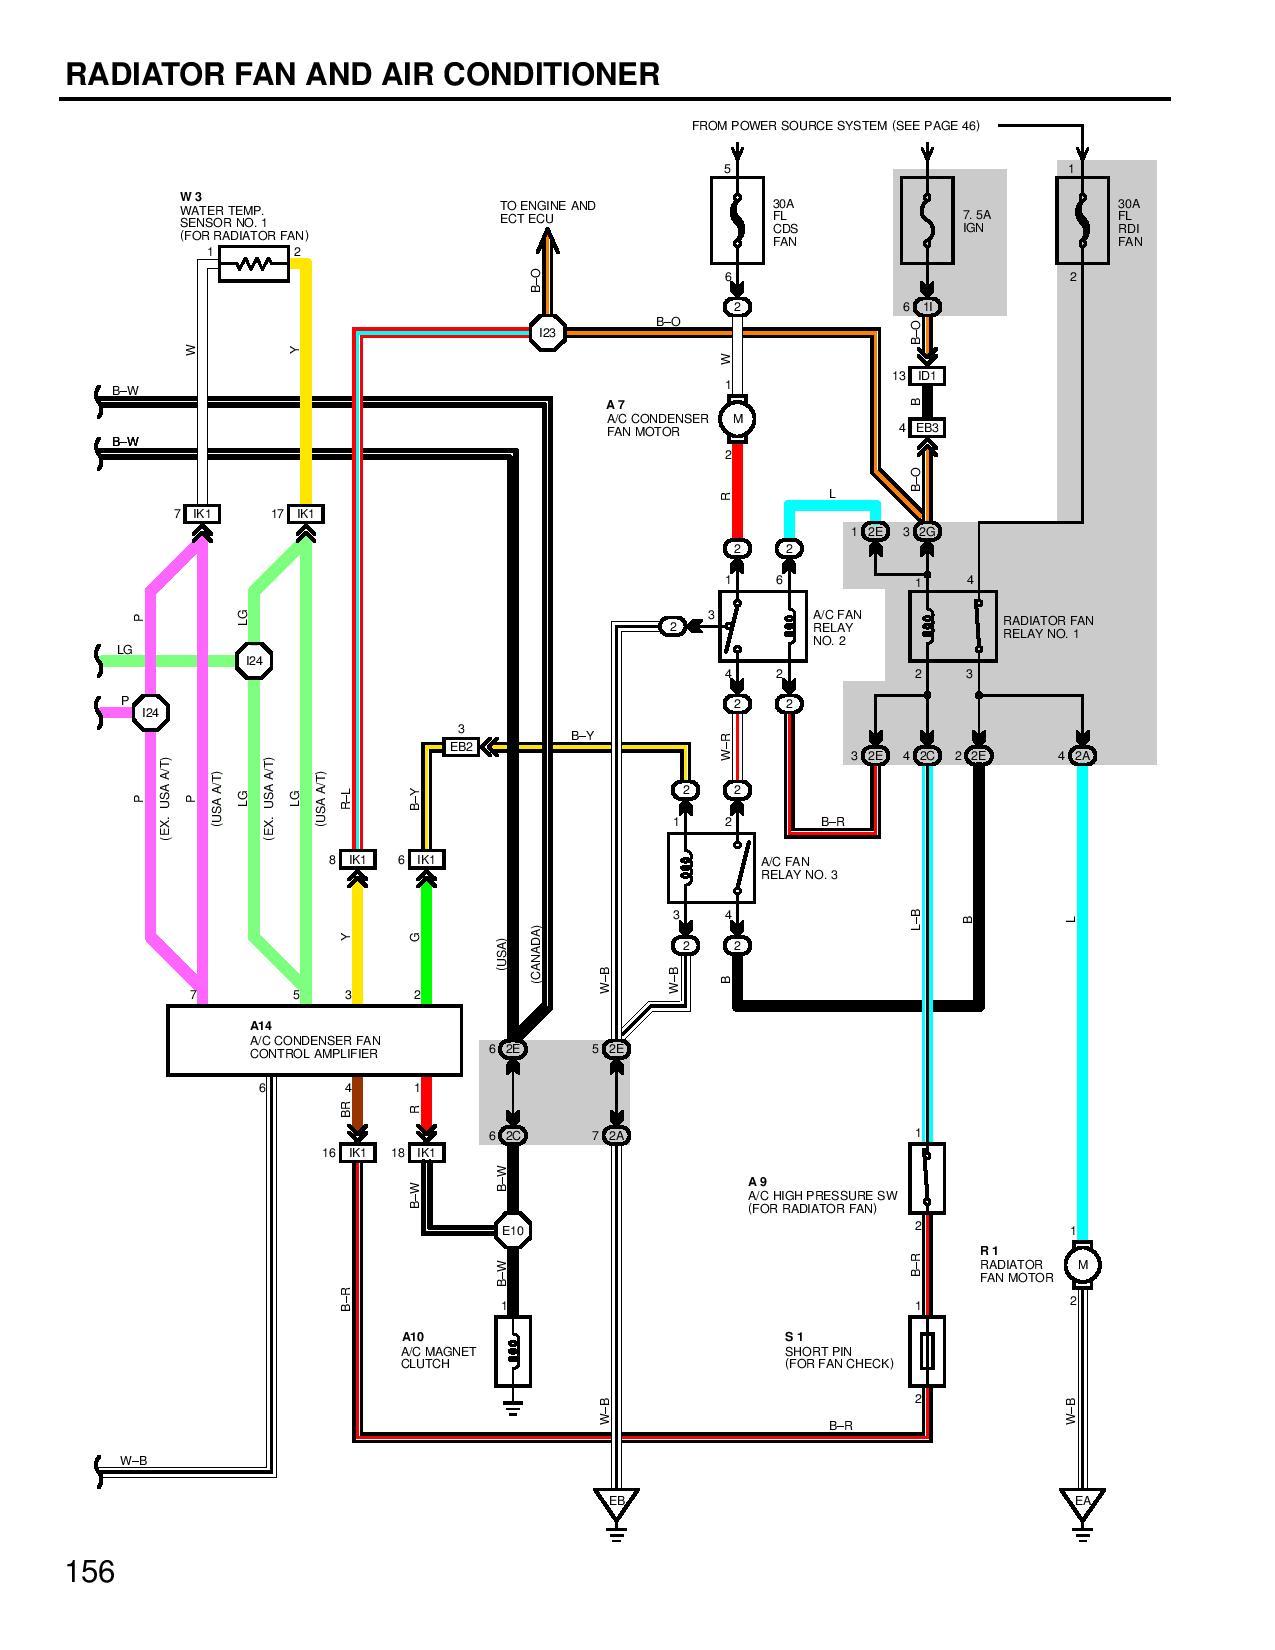 daihatsu mira engine wiring diagram wiring diagram features daihatsu mira engine wiring diagram wiring diagrams daihatsu mira engine wiring diagram